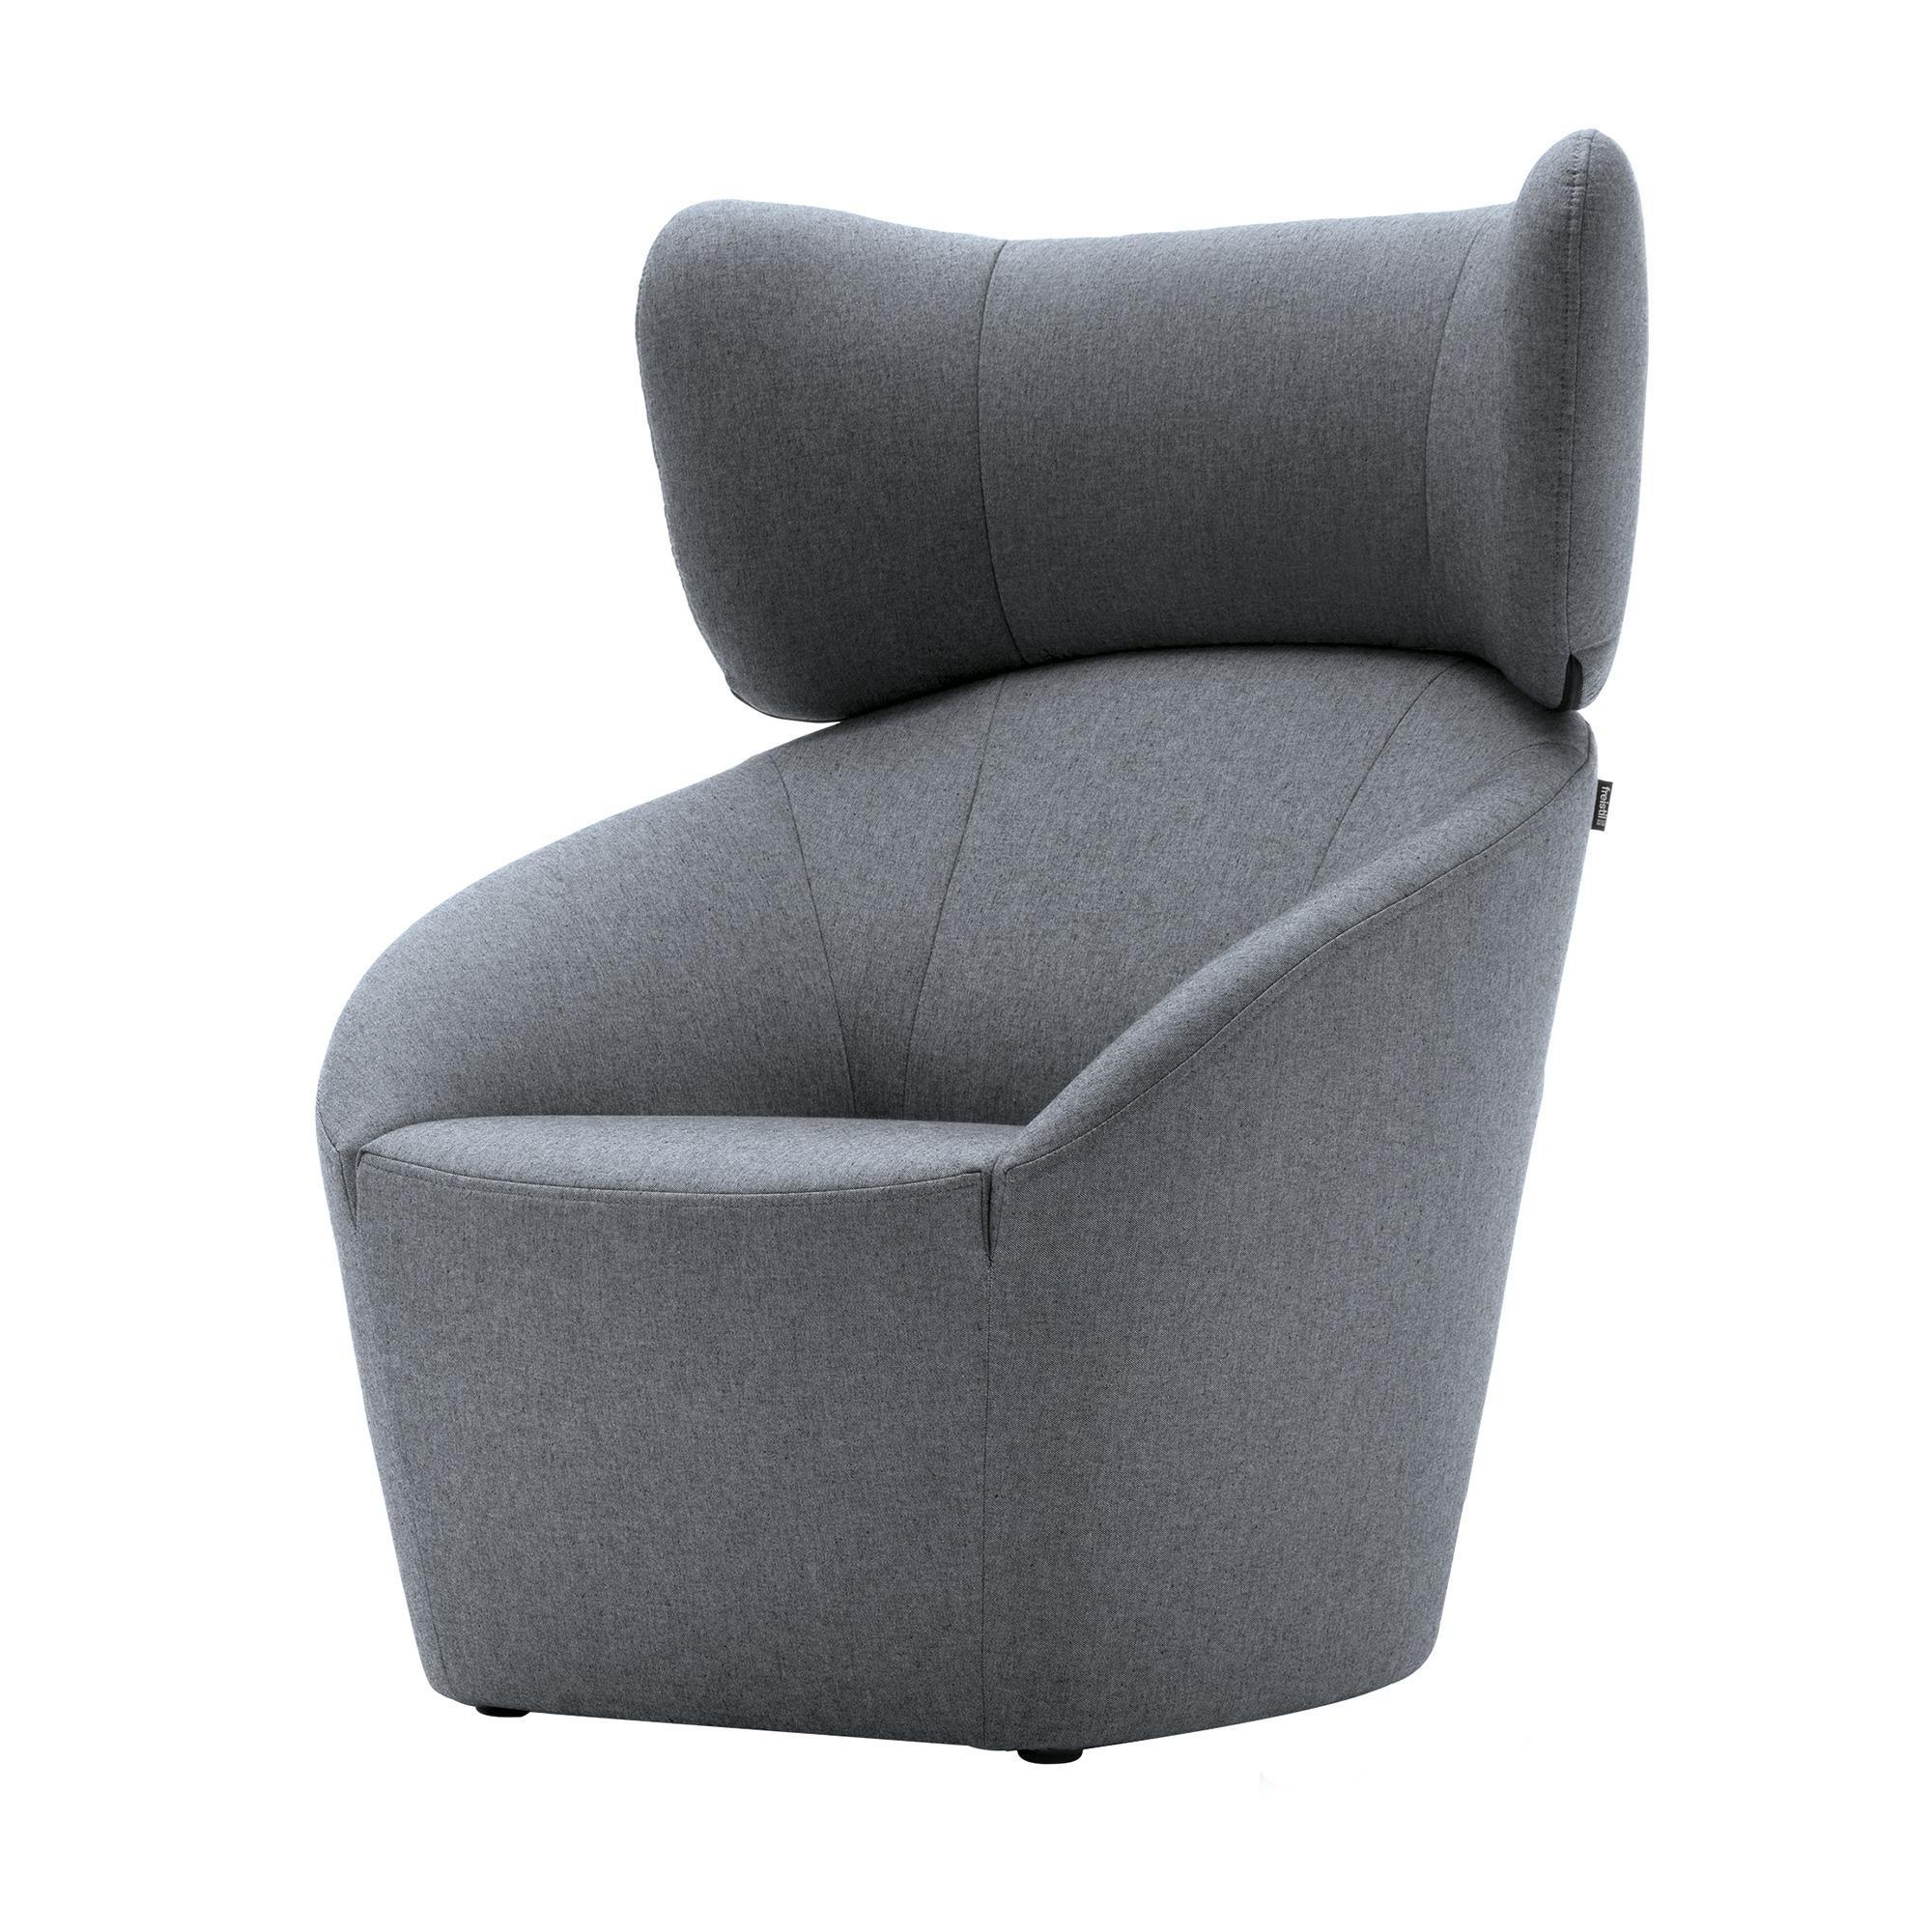 freistil rolf benz freistil 178 fauteuil avec appui t te. Black Bedroom Furniture Sets. Home Design Ideas